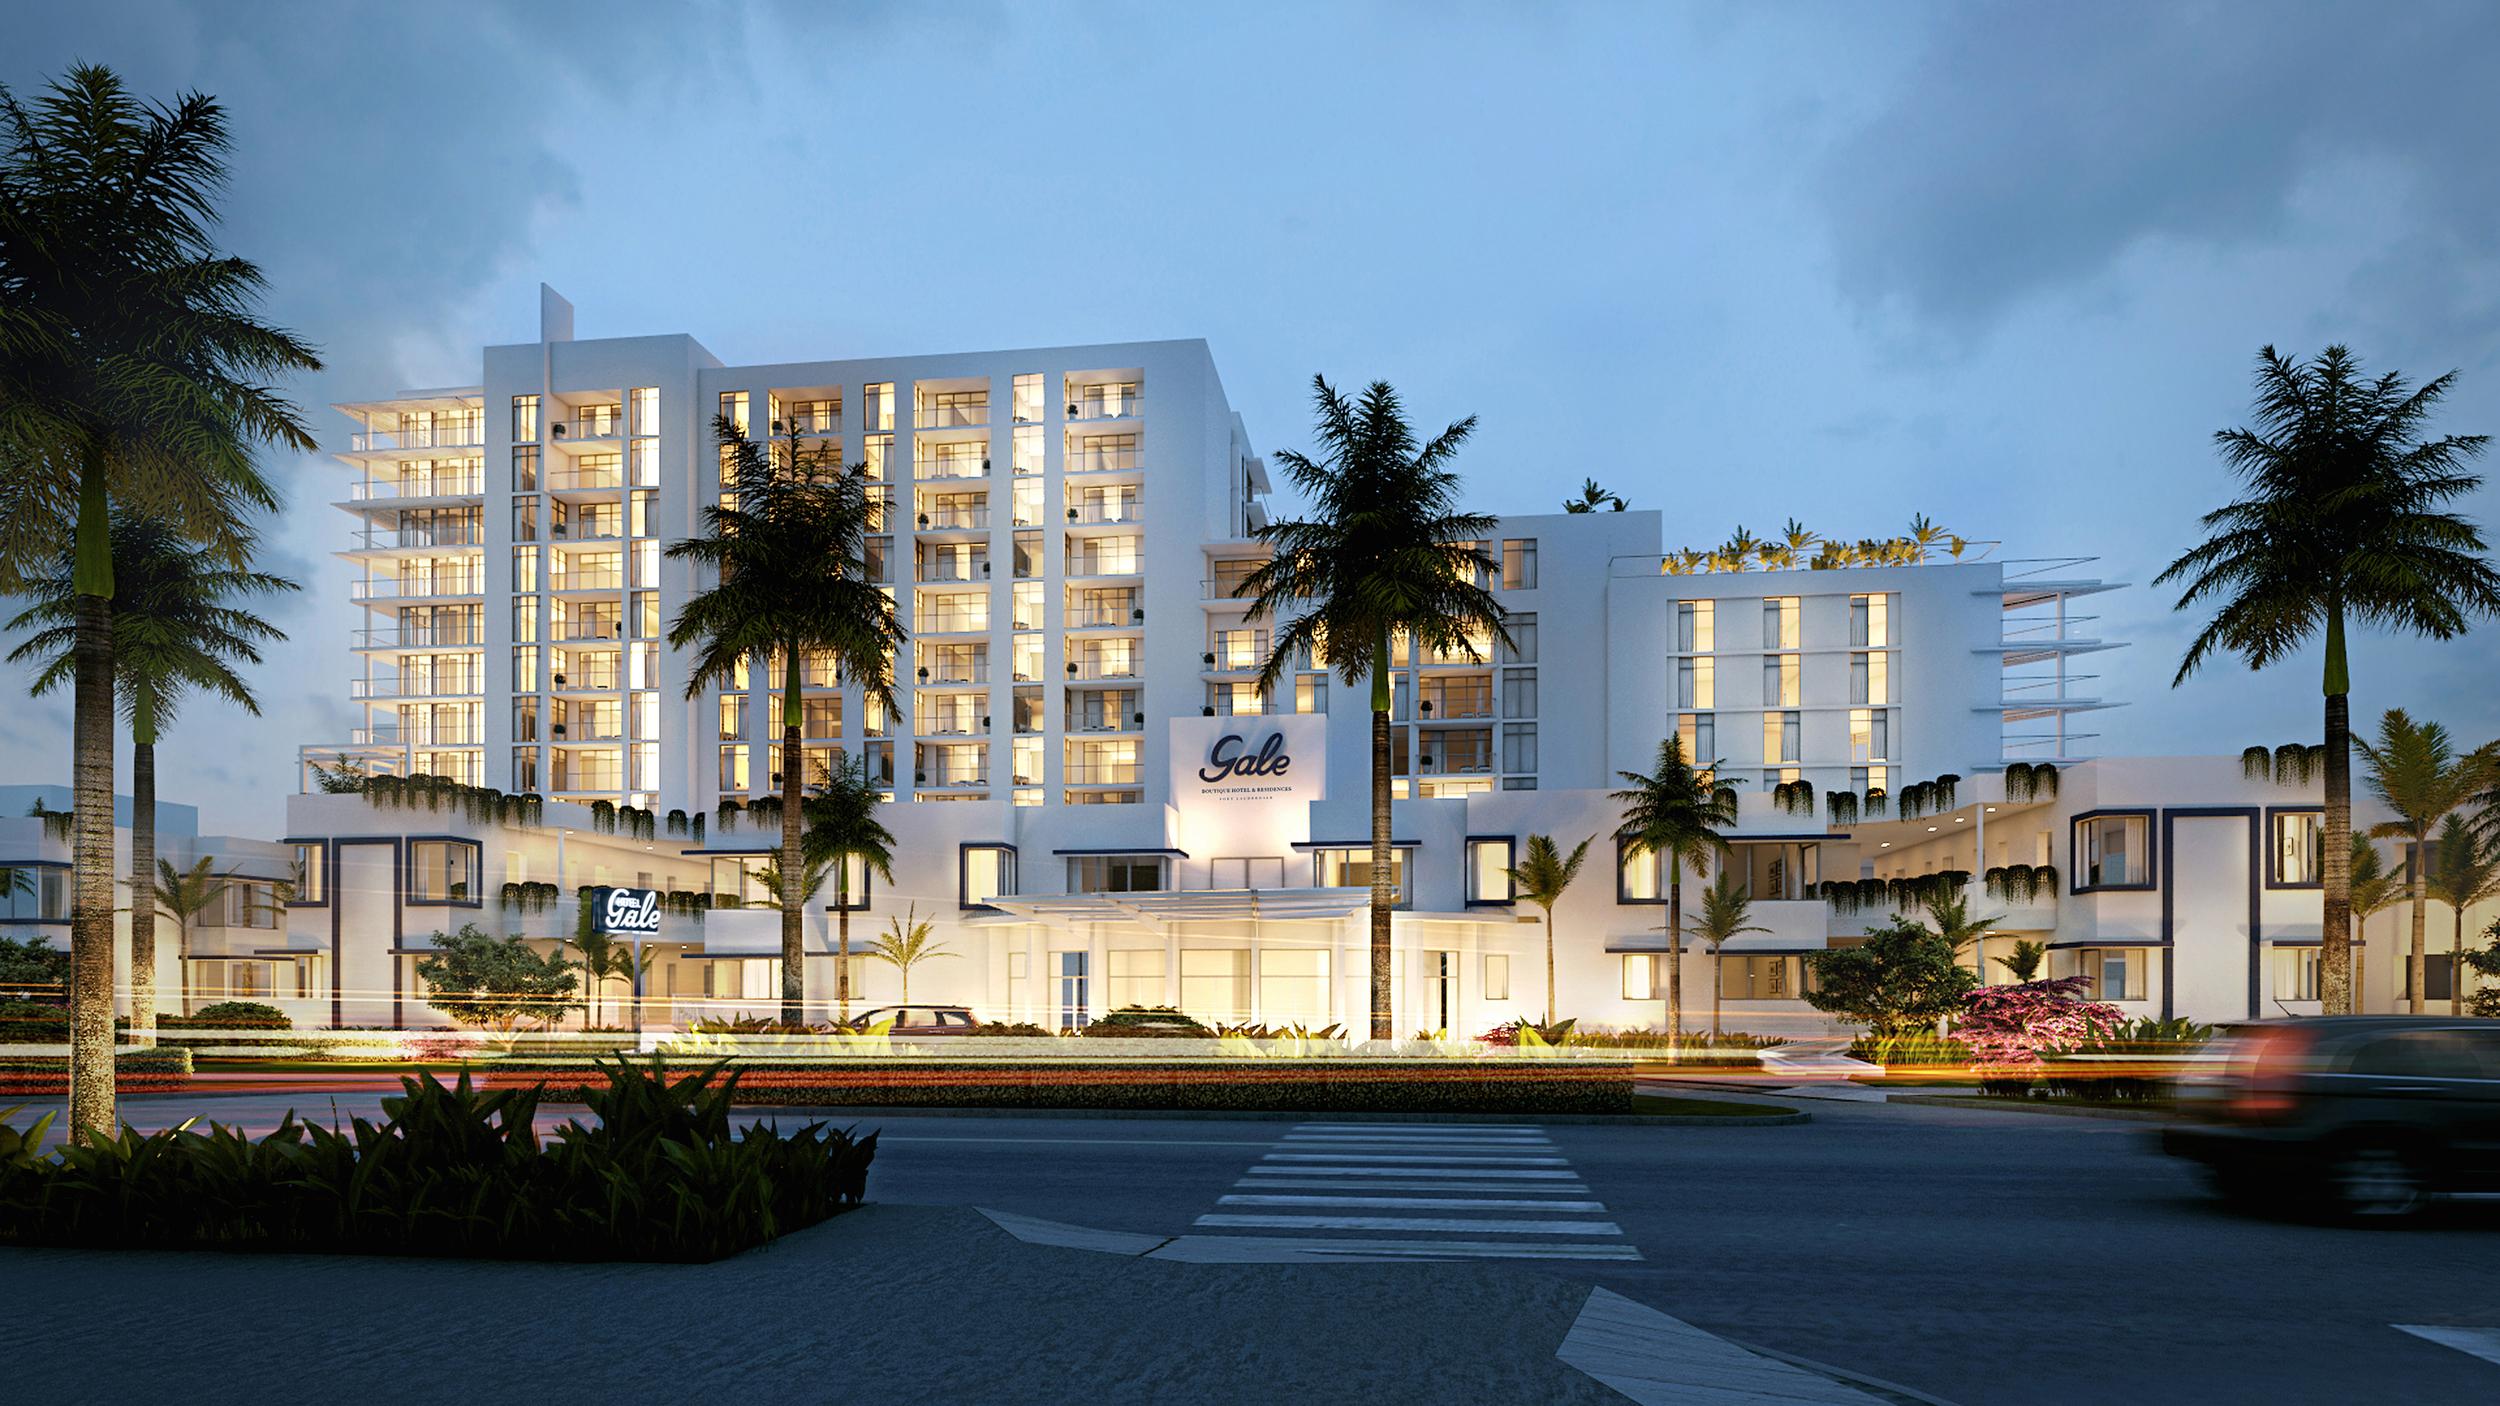 Gale Ft.Lauderdale Hotel Boutique Building at Dusk